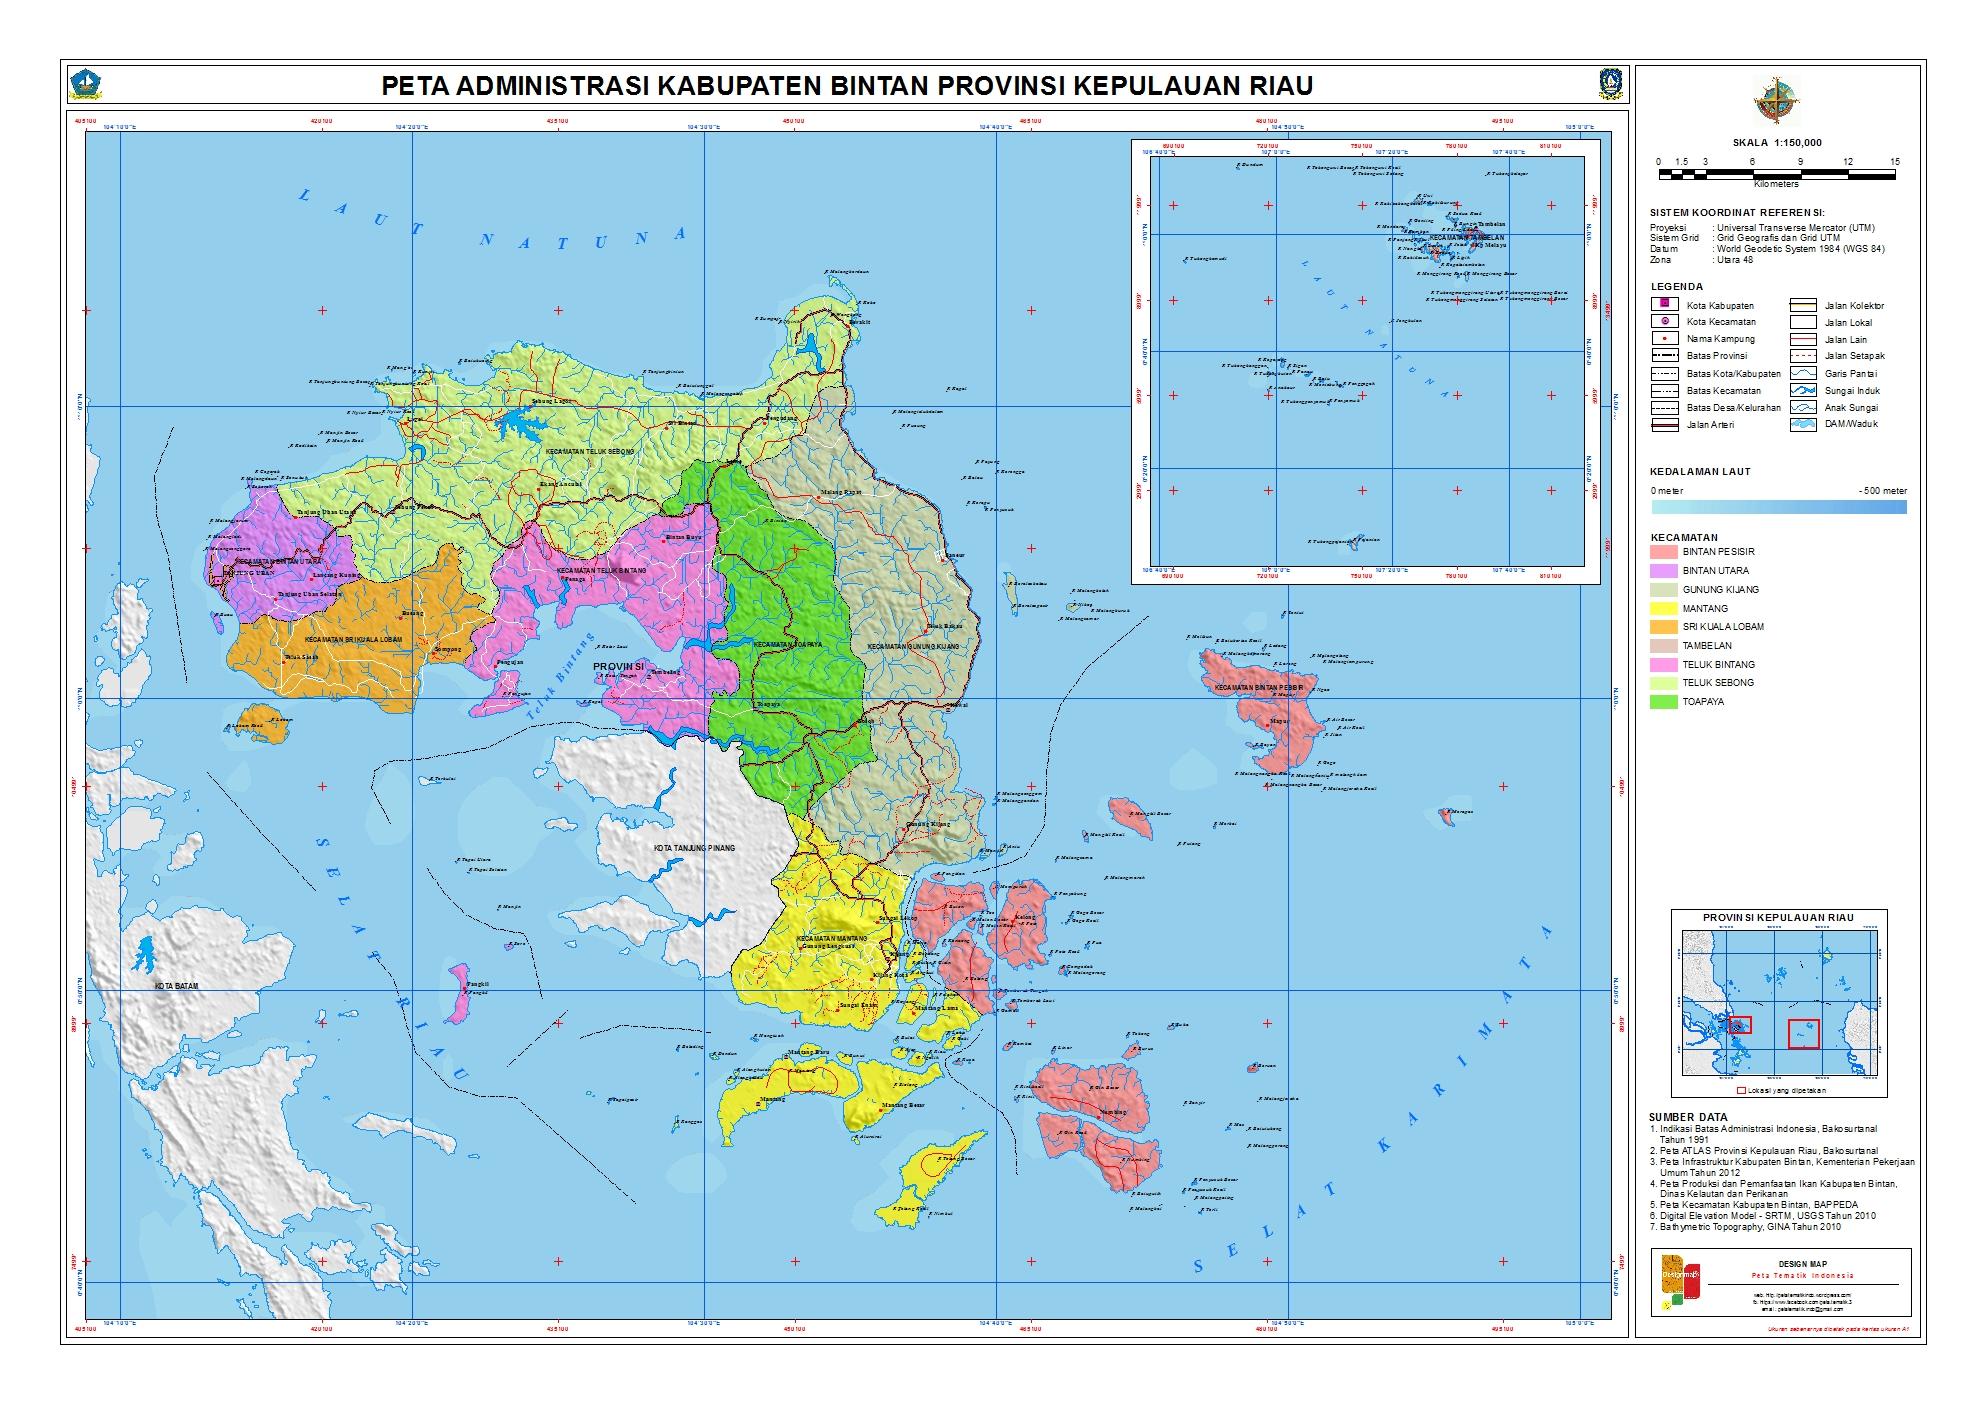 Peta Kota: Peta Kabupaten Bintan